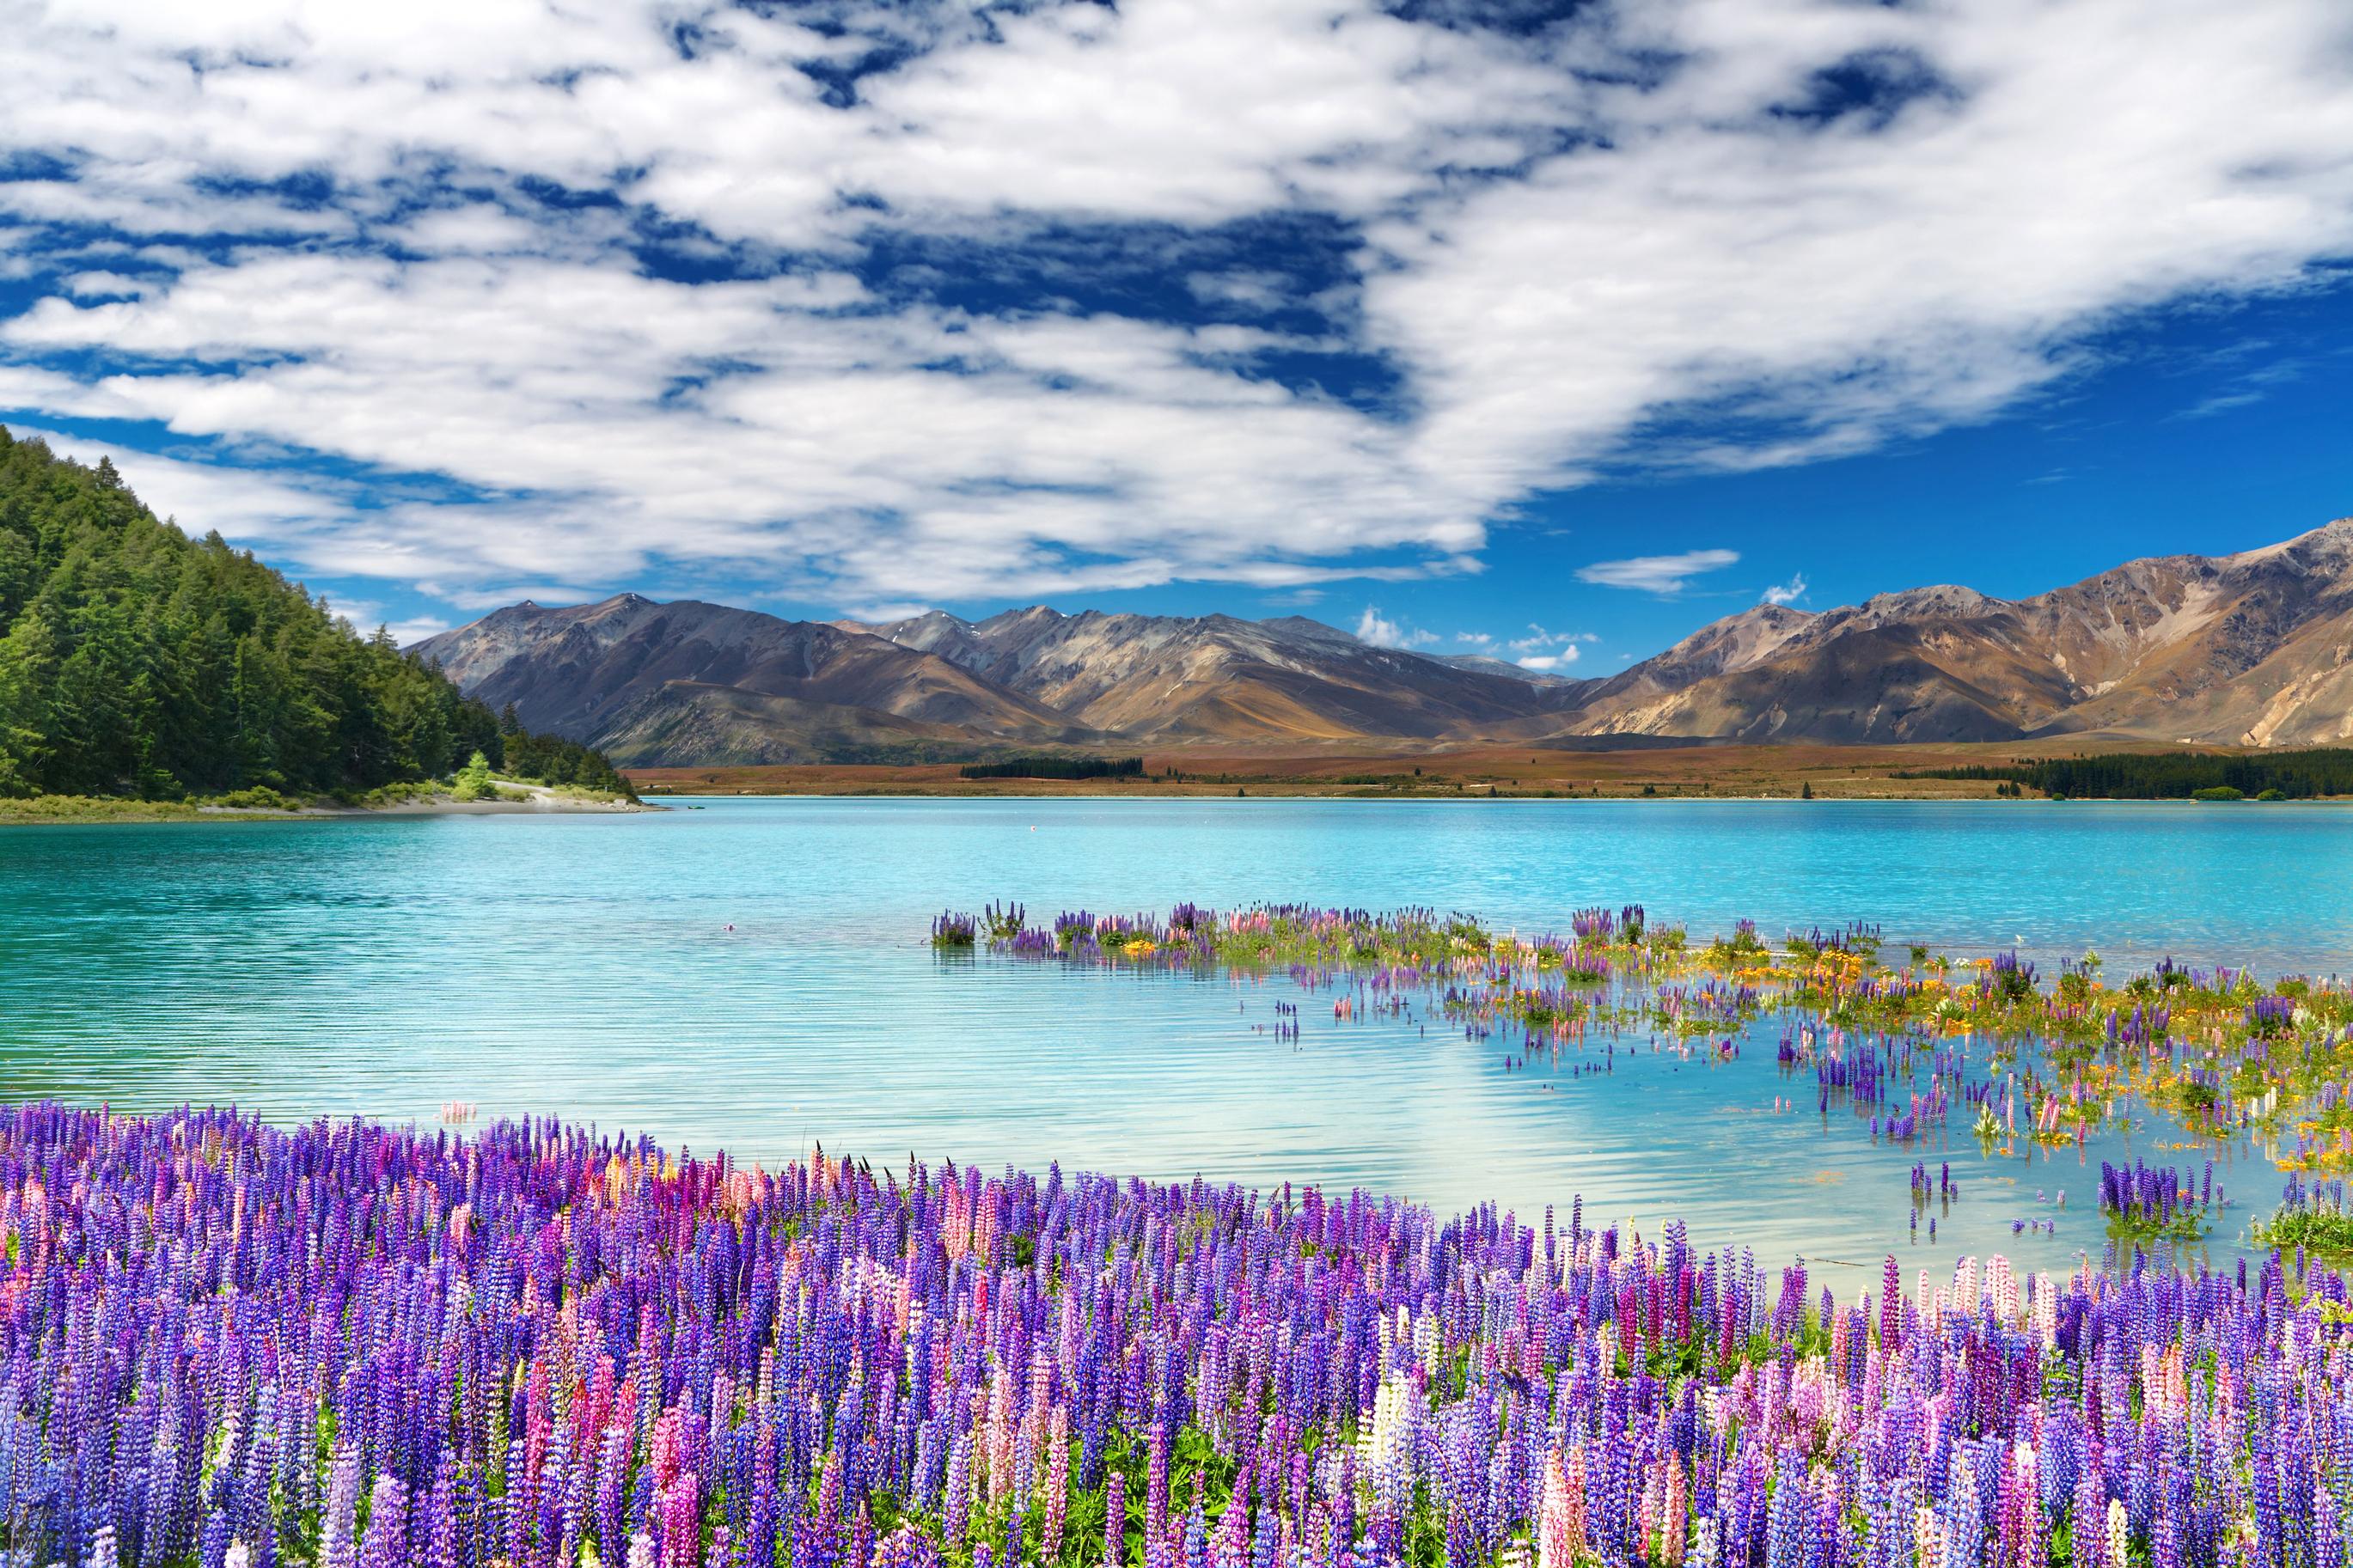 Images of Lake Tekapo | 2738x1825